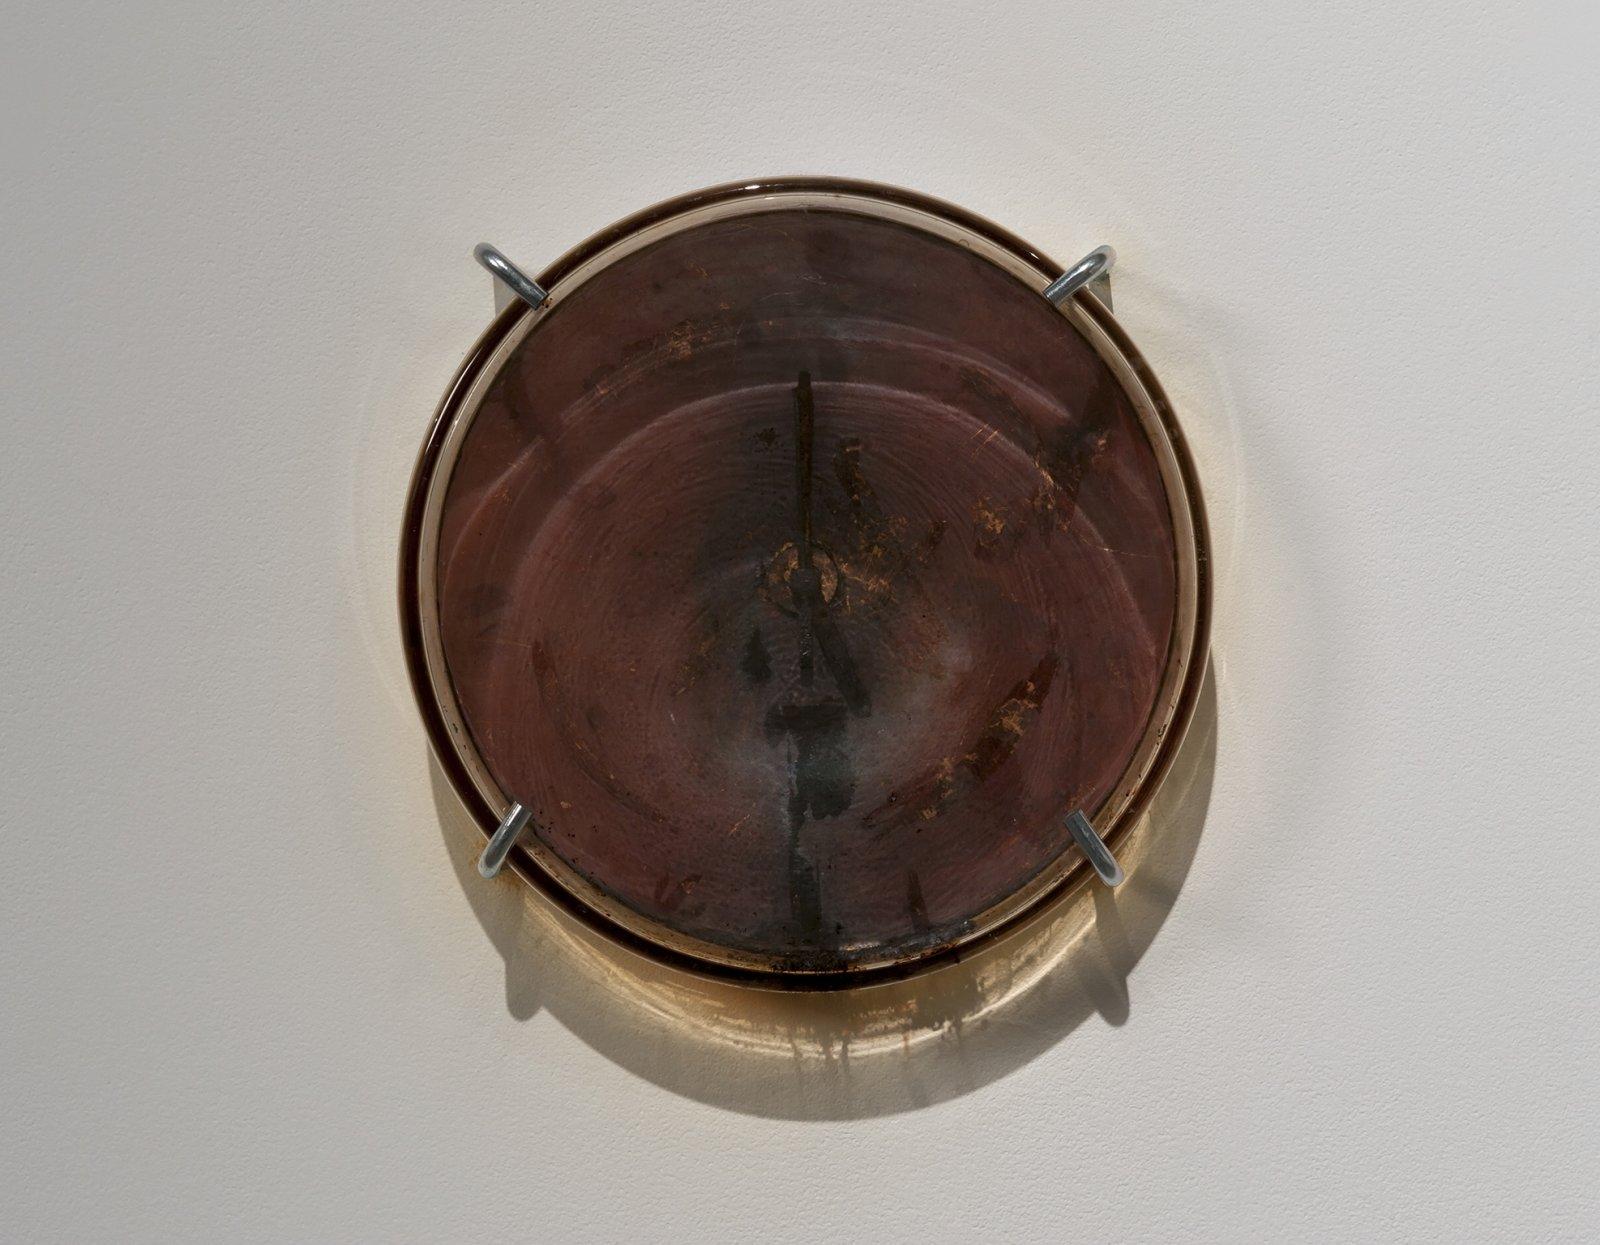 Julia Feyrer, Sublimation Clock, 2012, iodine crystals, silver leaf, lampblack, glass, acrylic, metal clock hands, quartz clock movement, 12 x 12 x 3 in. (30 x 30 x 7 cm) by Julia Feyrer